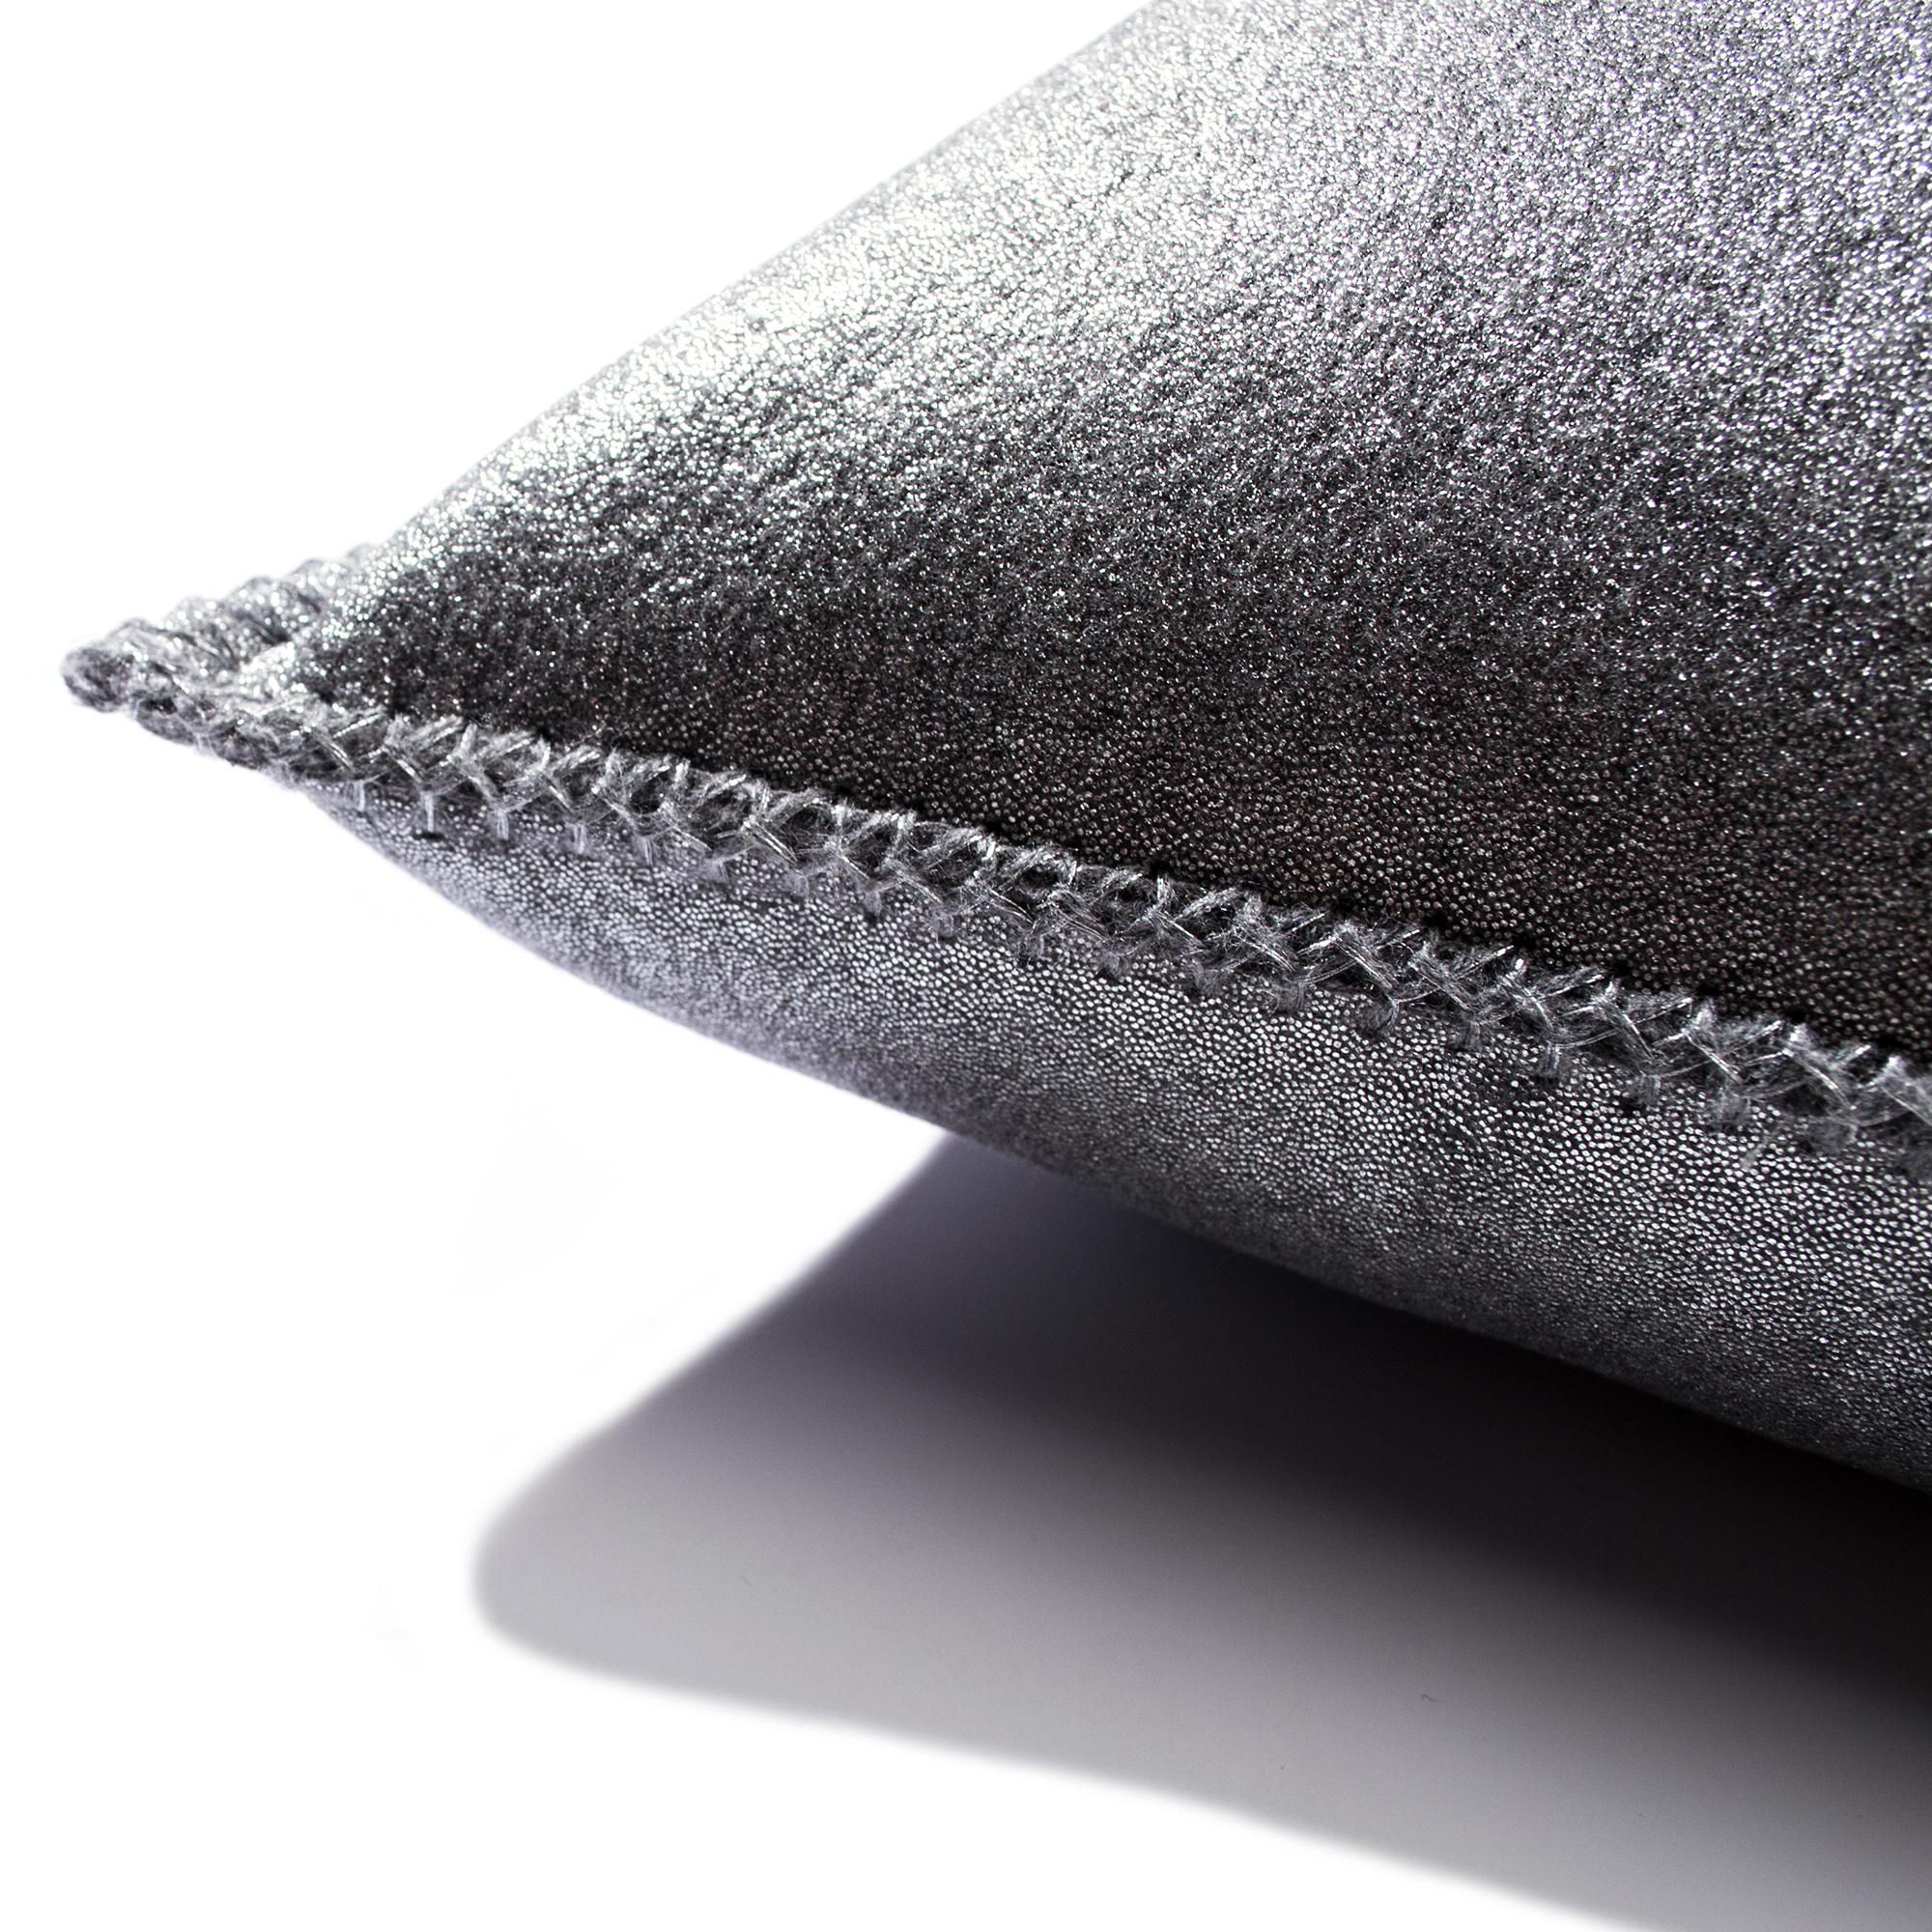 kissenbezug grau 50x50 x kissenbezug schwarz kissenhulle nahen anleitung ikea x kissenbezug. Black Bedroom Furniture Sets. Home Design Ideas